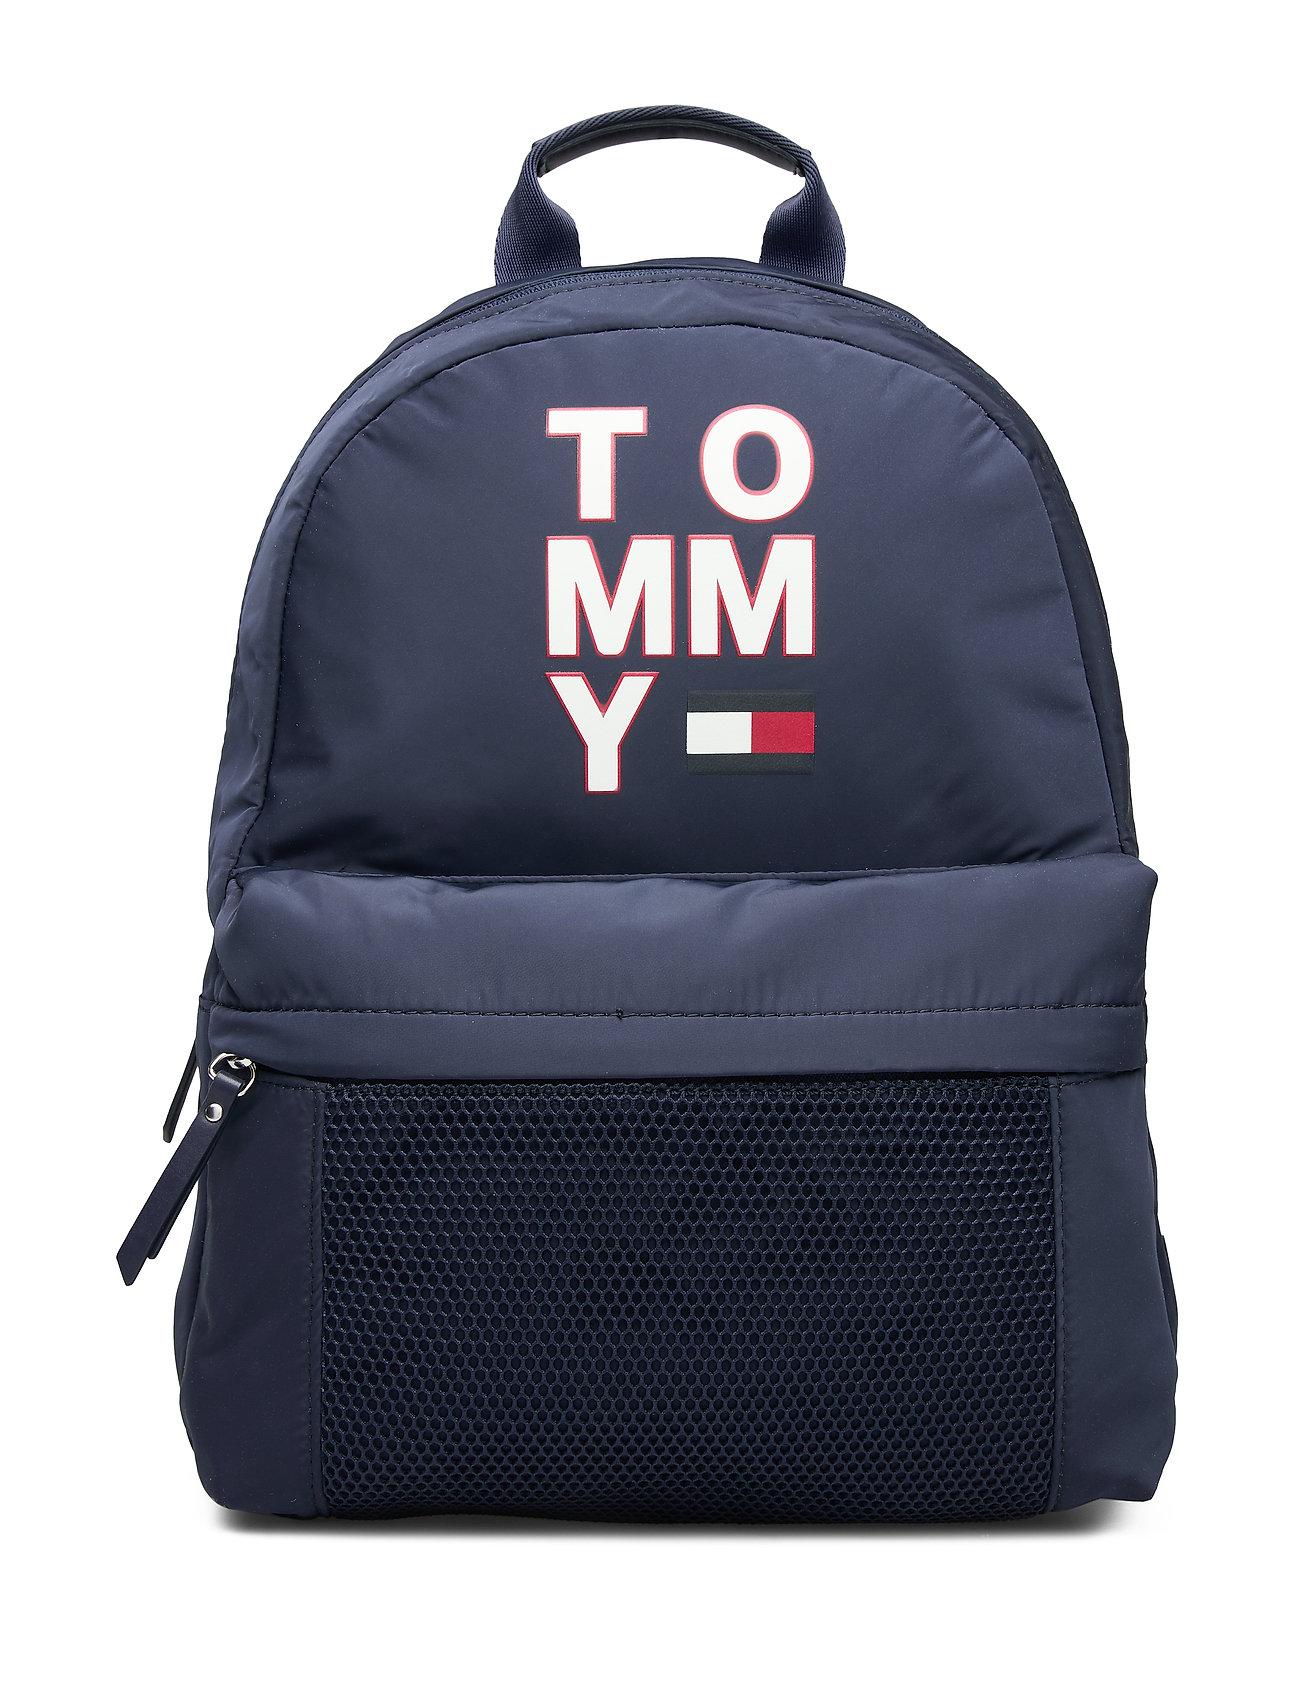 Tommy Hilfiger TH KIDS TOMMY BACKPA - BLACK IRIS